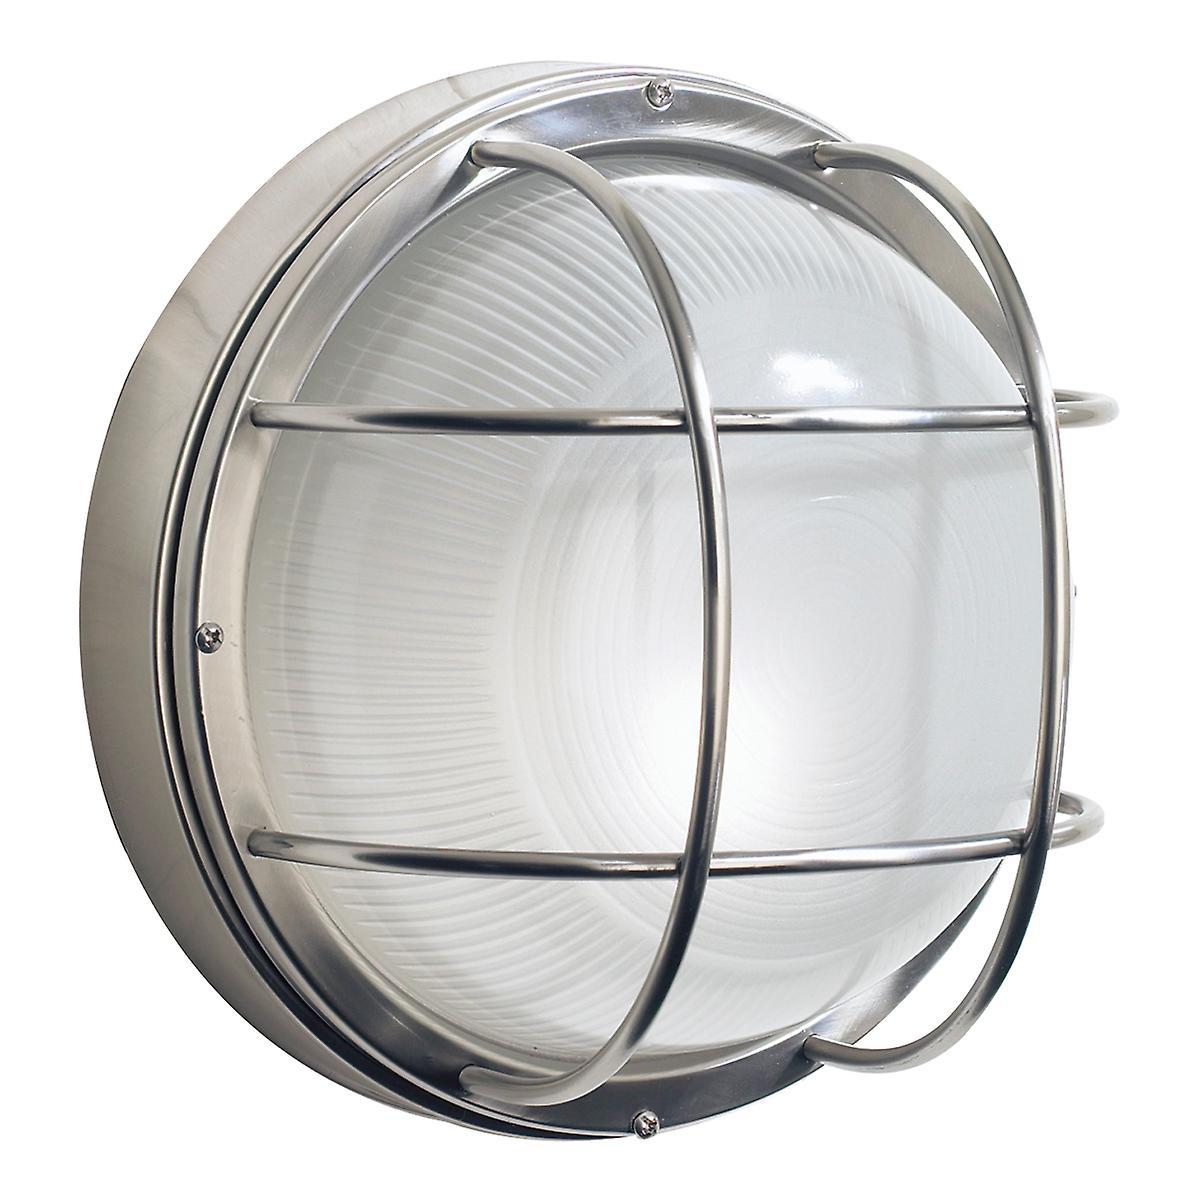 Dar SAL5044 Salcombe Large Round Steel Outdoor Wall Light